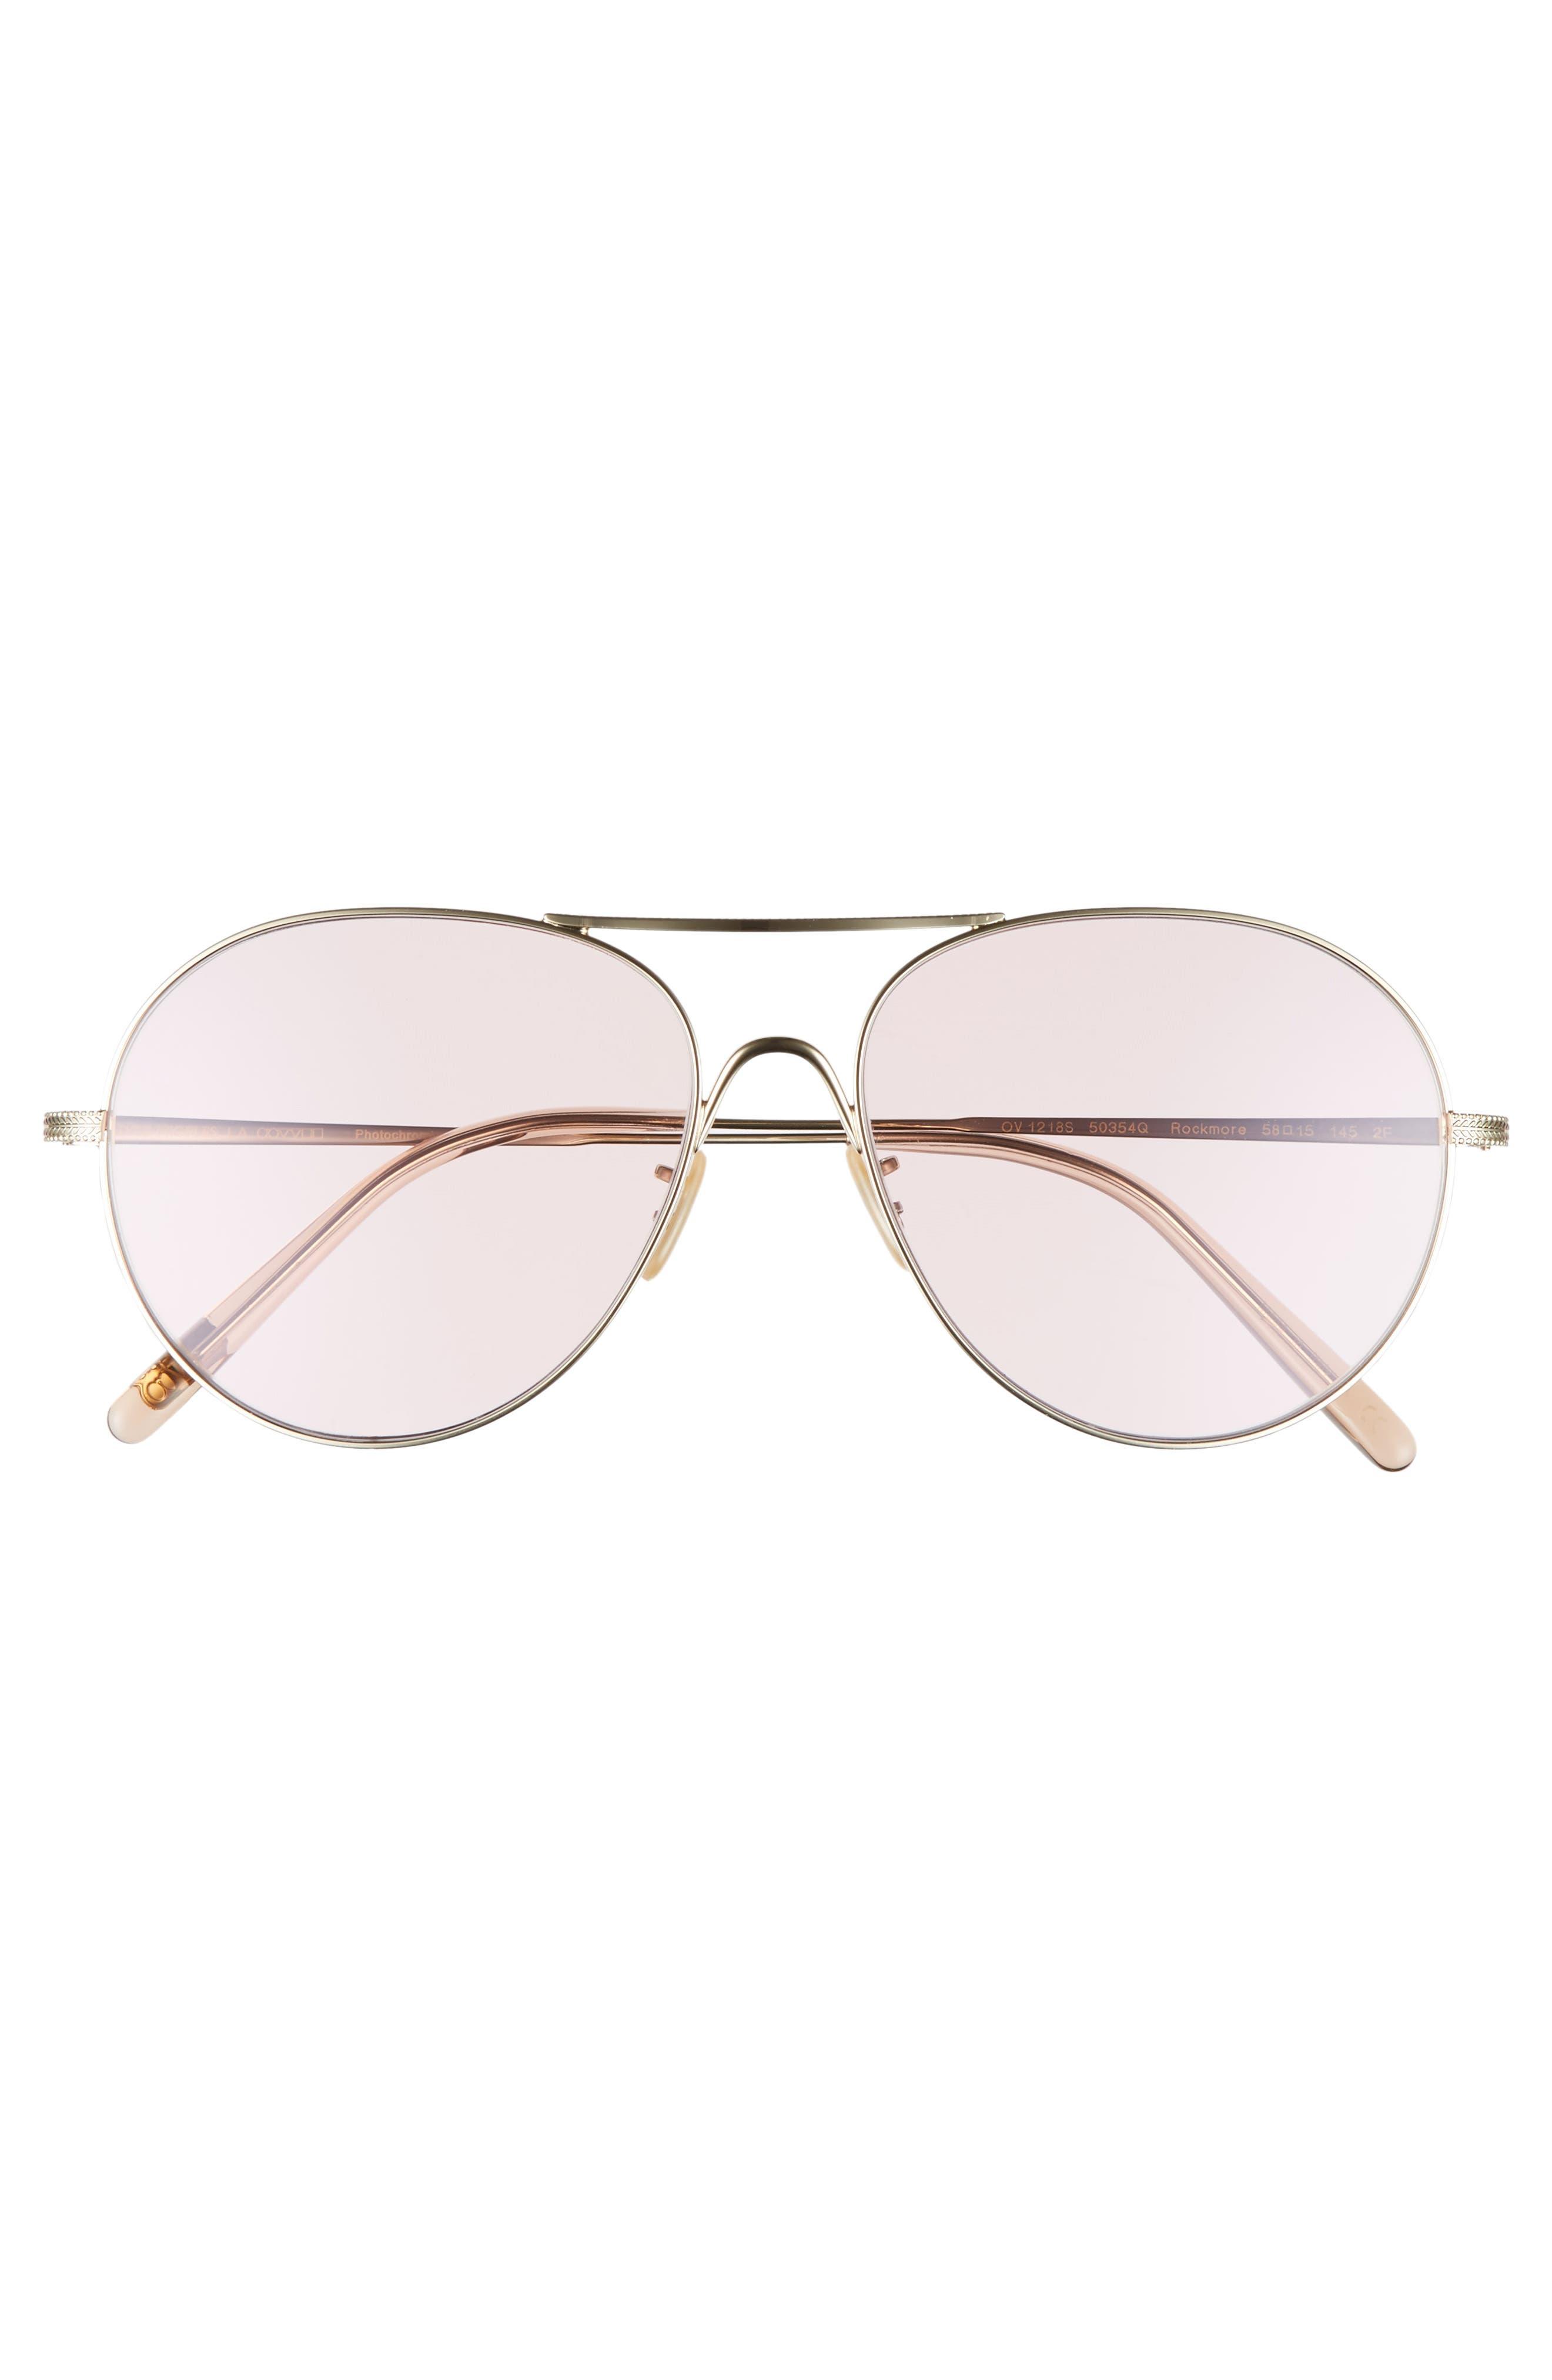 Rockmore 58mm Aviator Sunglasses,                             Alternate thumbnail 3, color,                             PINK